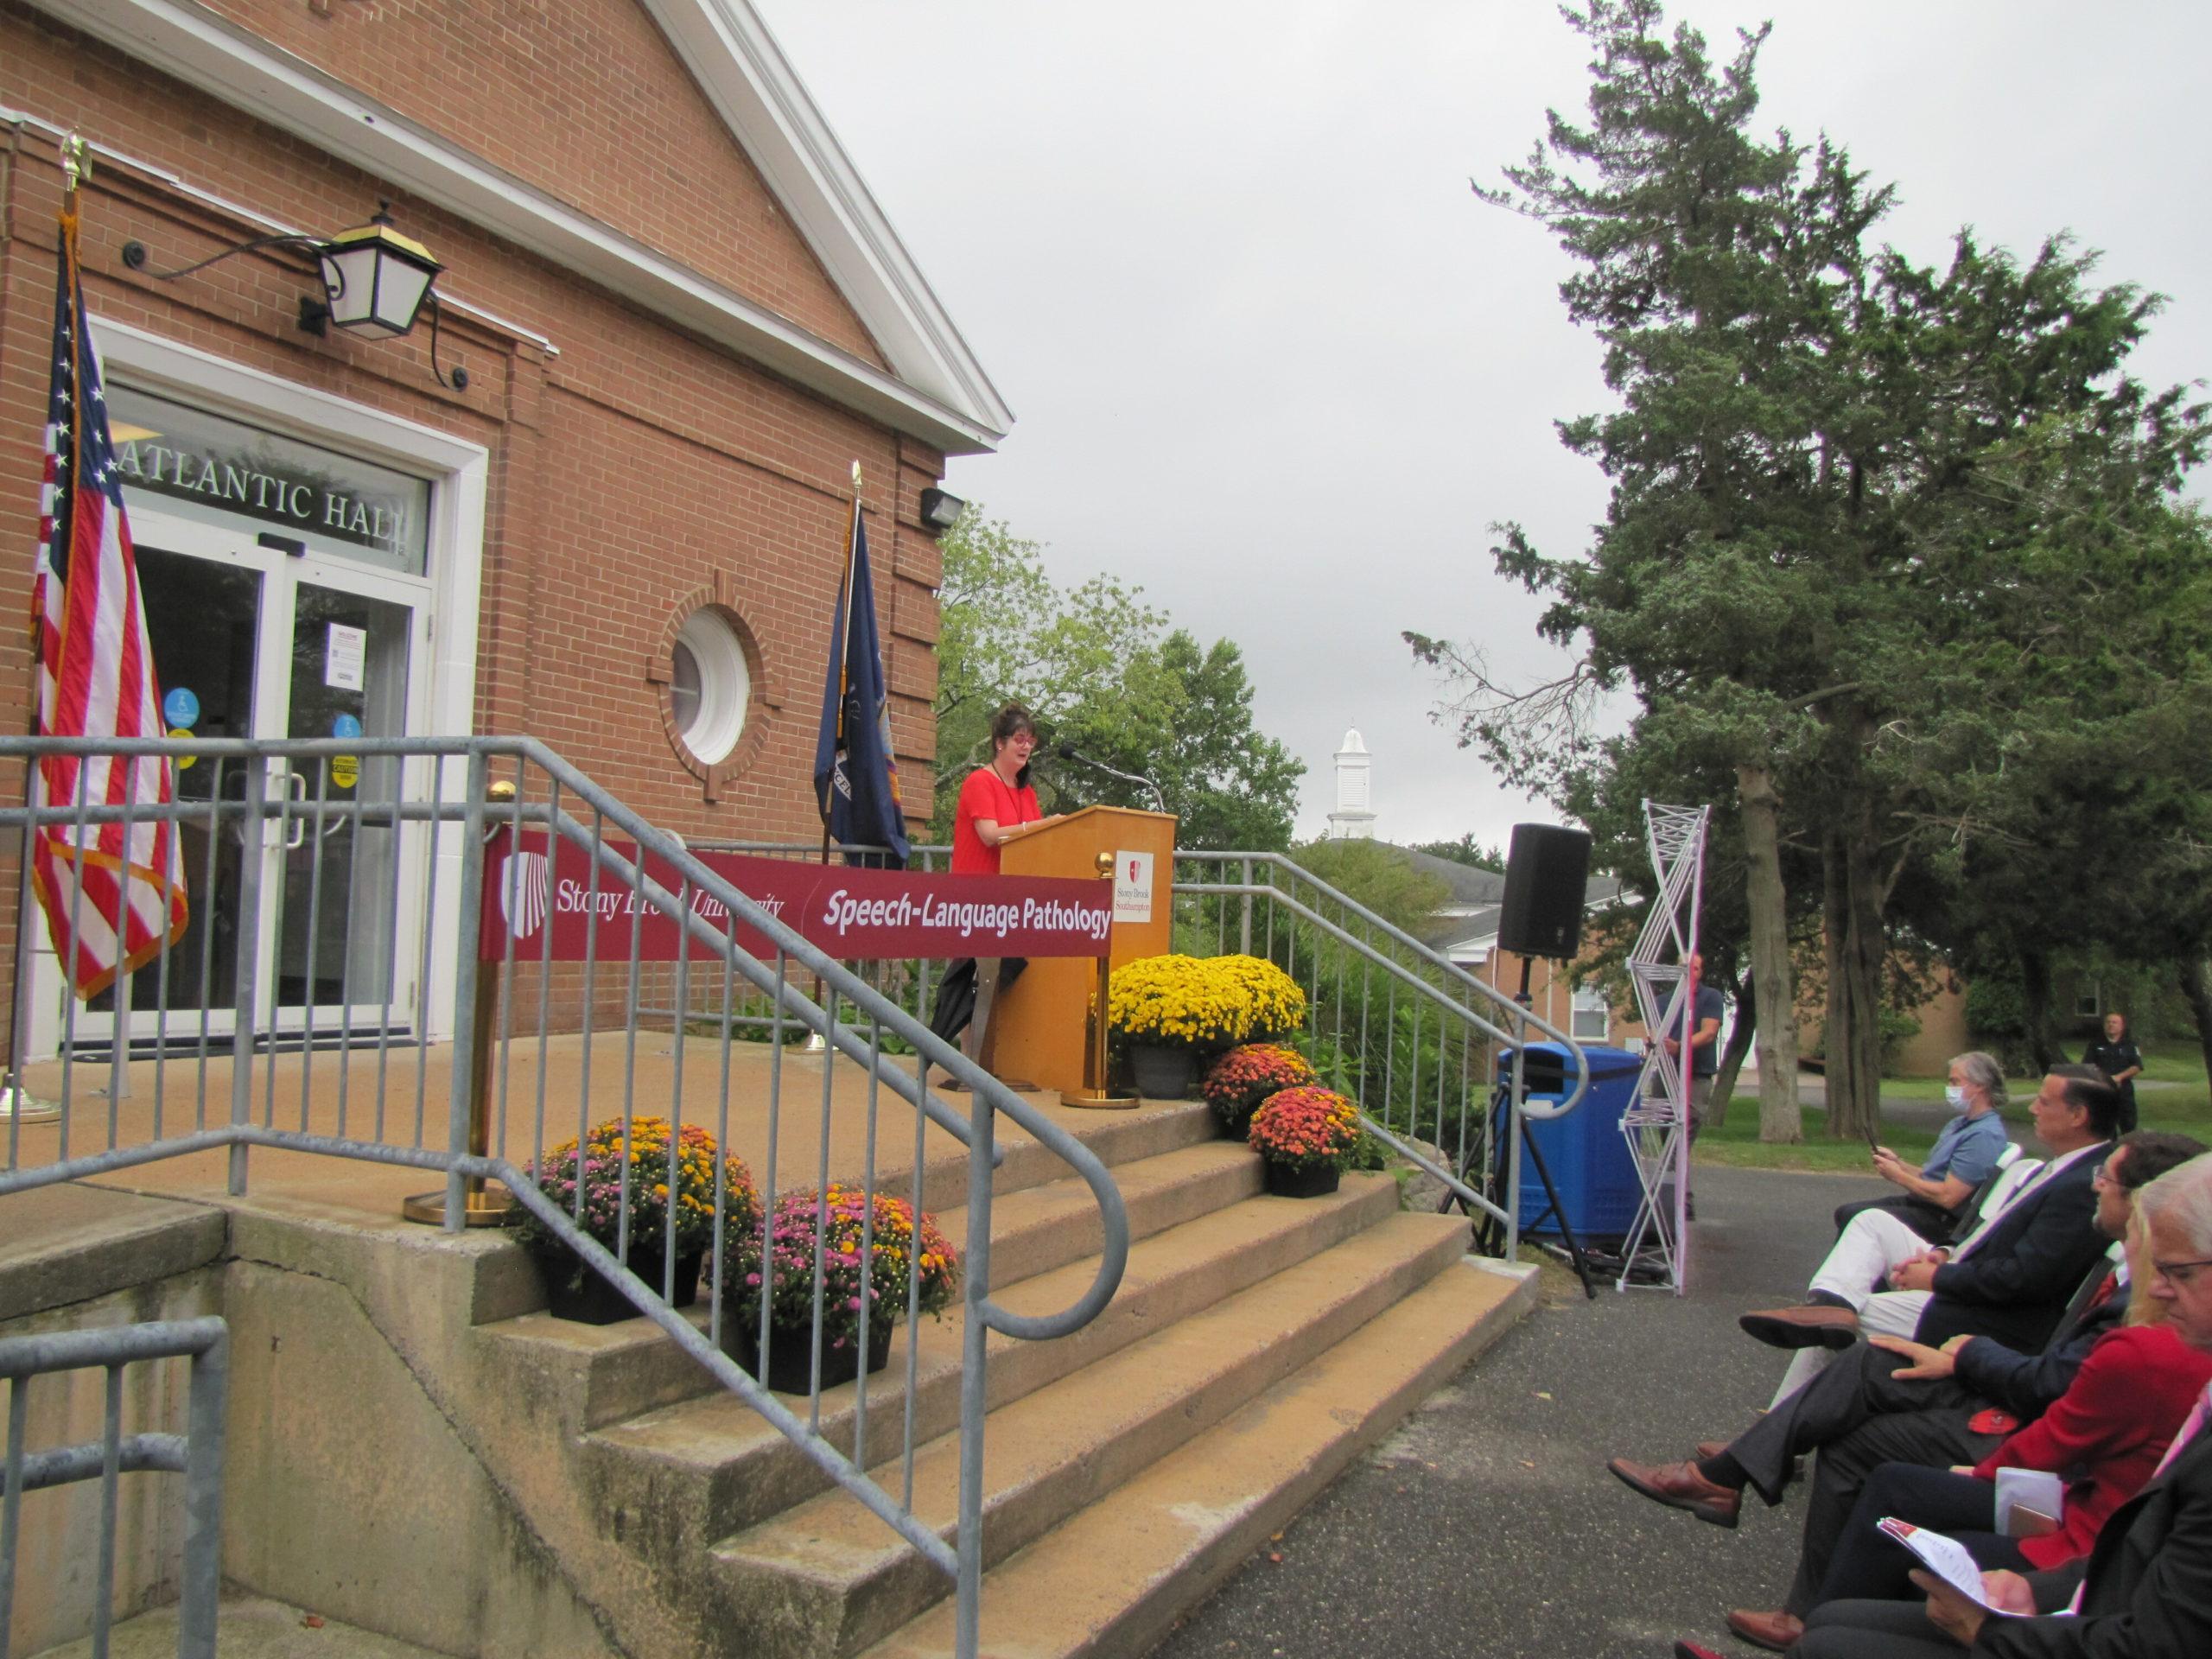 Stony Brook University officially opened its Speech-Language Patholgy Program's new center in the Atlantic Building at the Stony Brook Southampton campus on Friday.